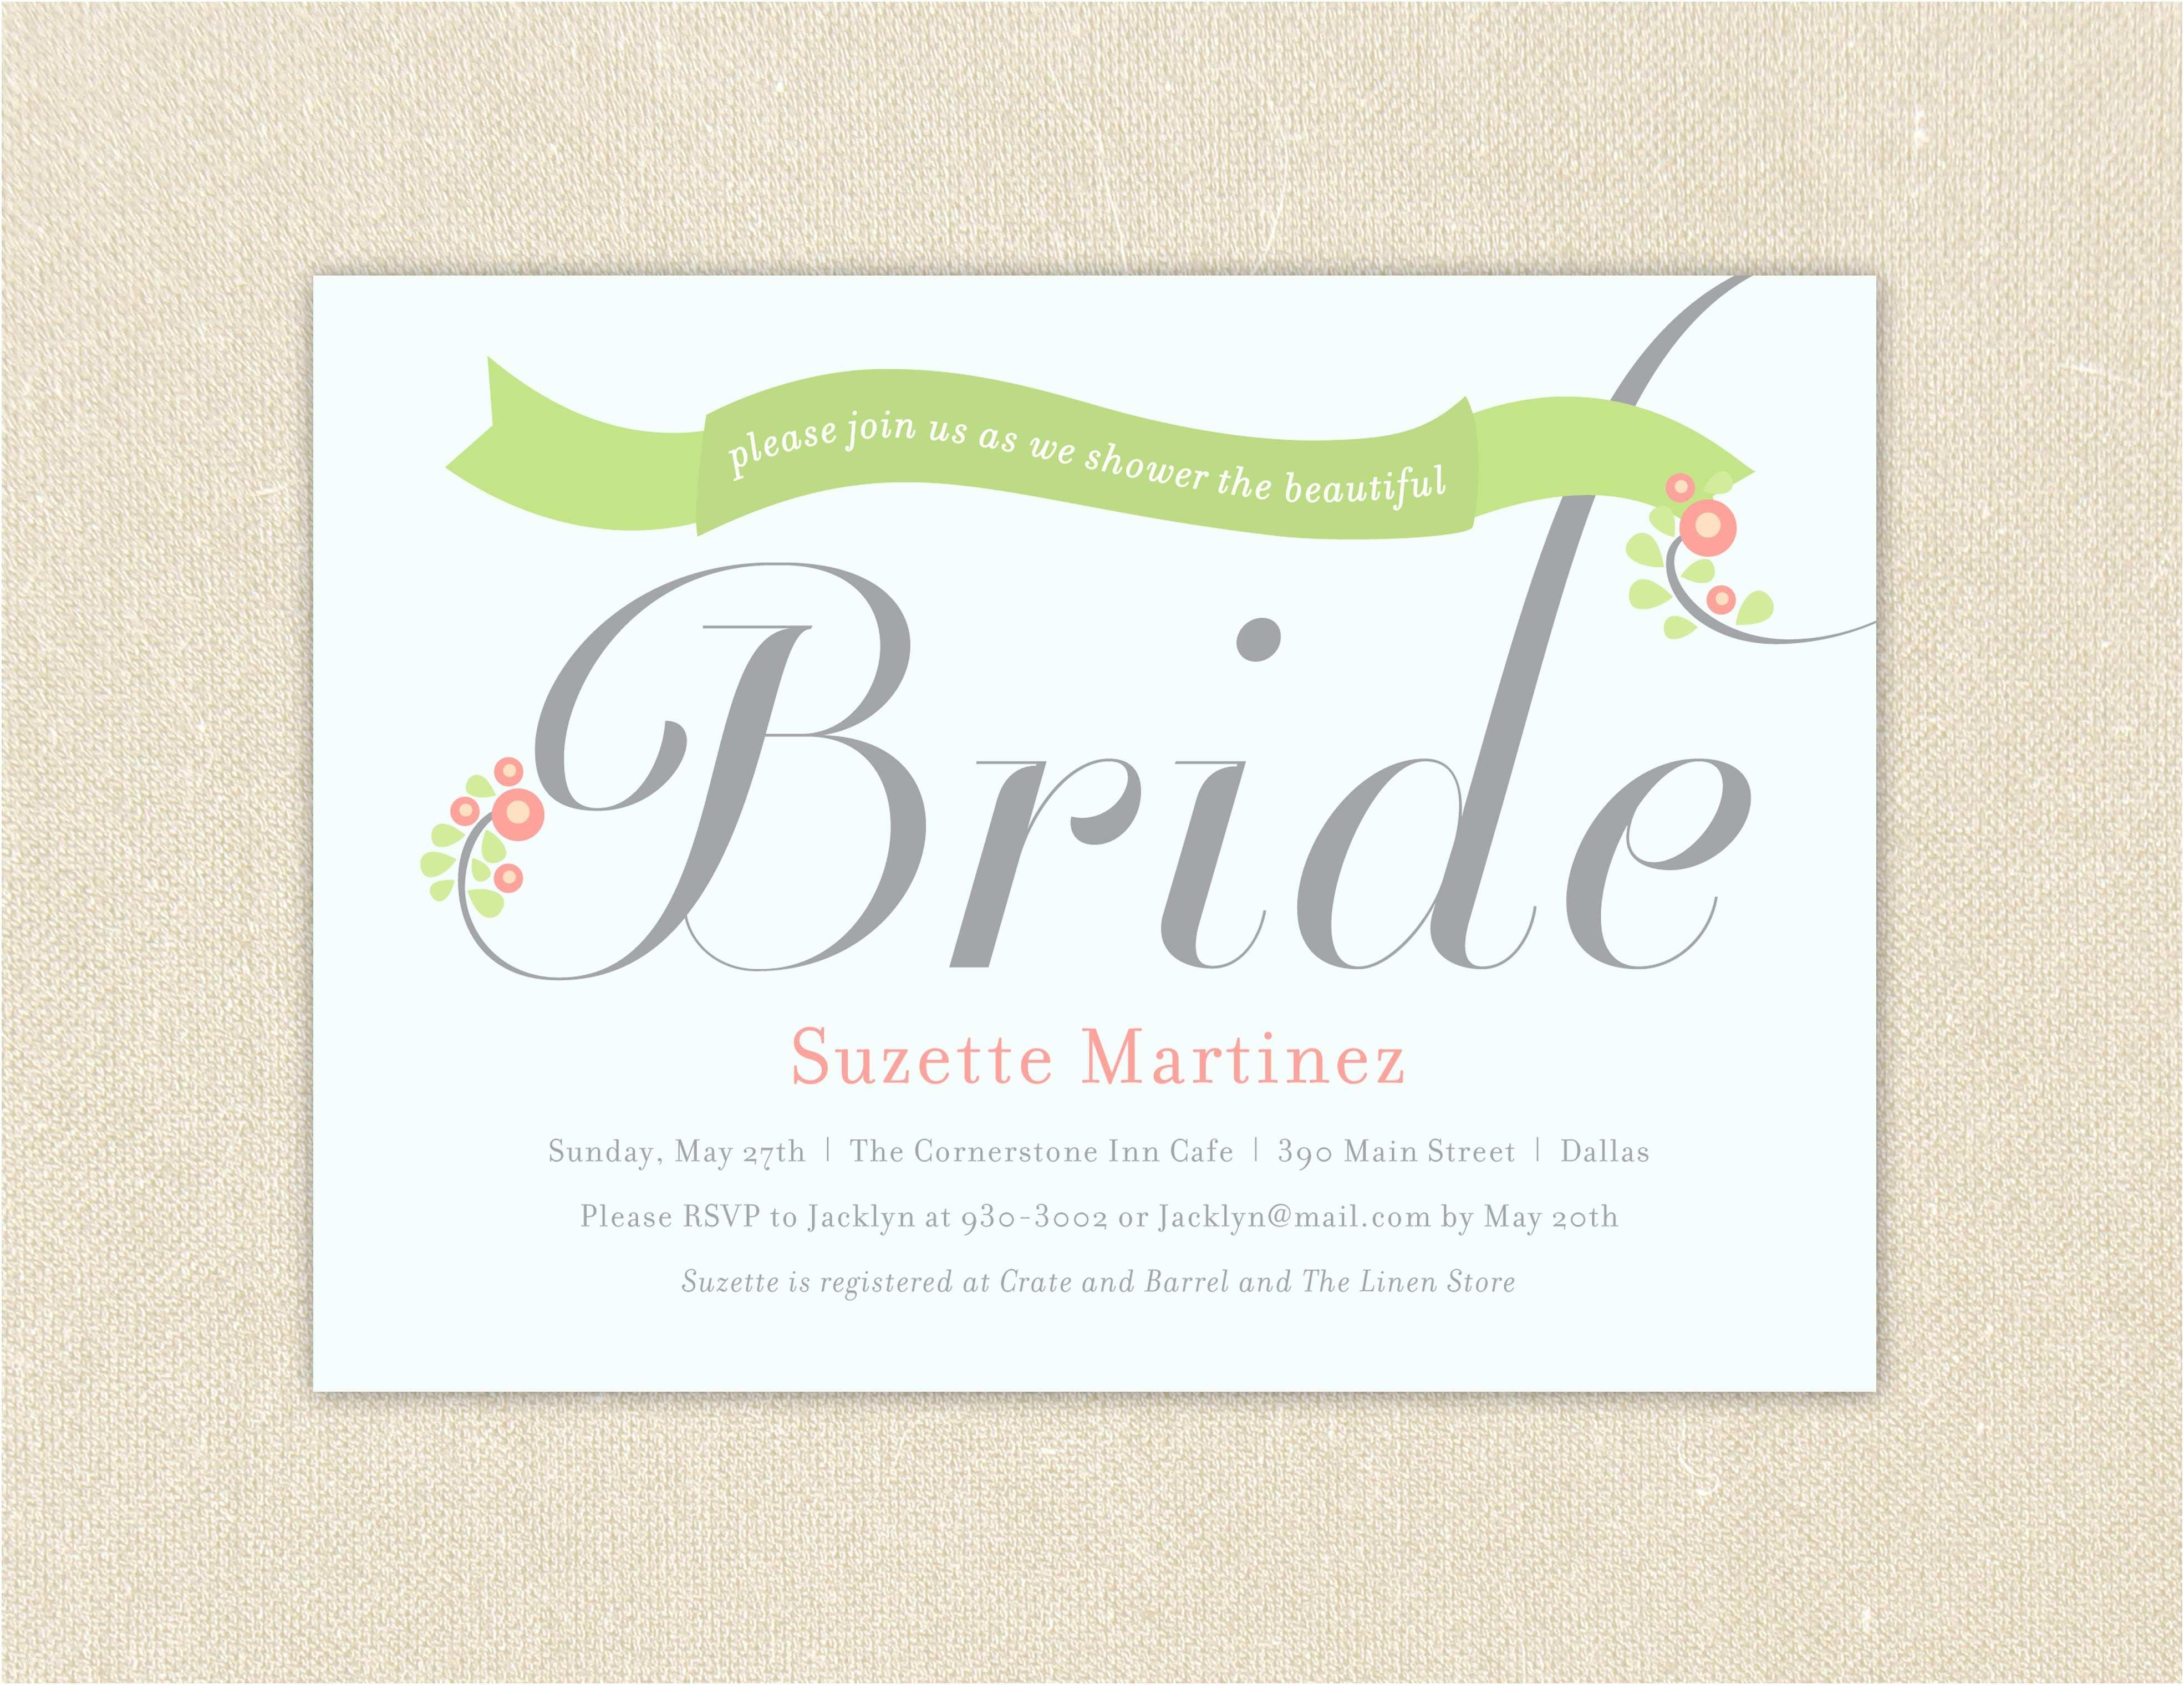 Free Bridal Shower Invitations Free Printable Mason Jar Image